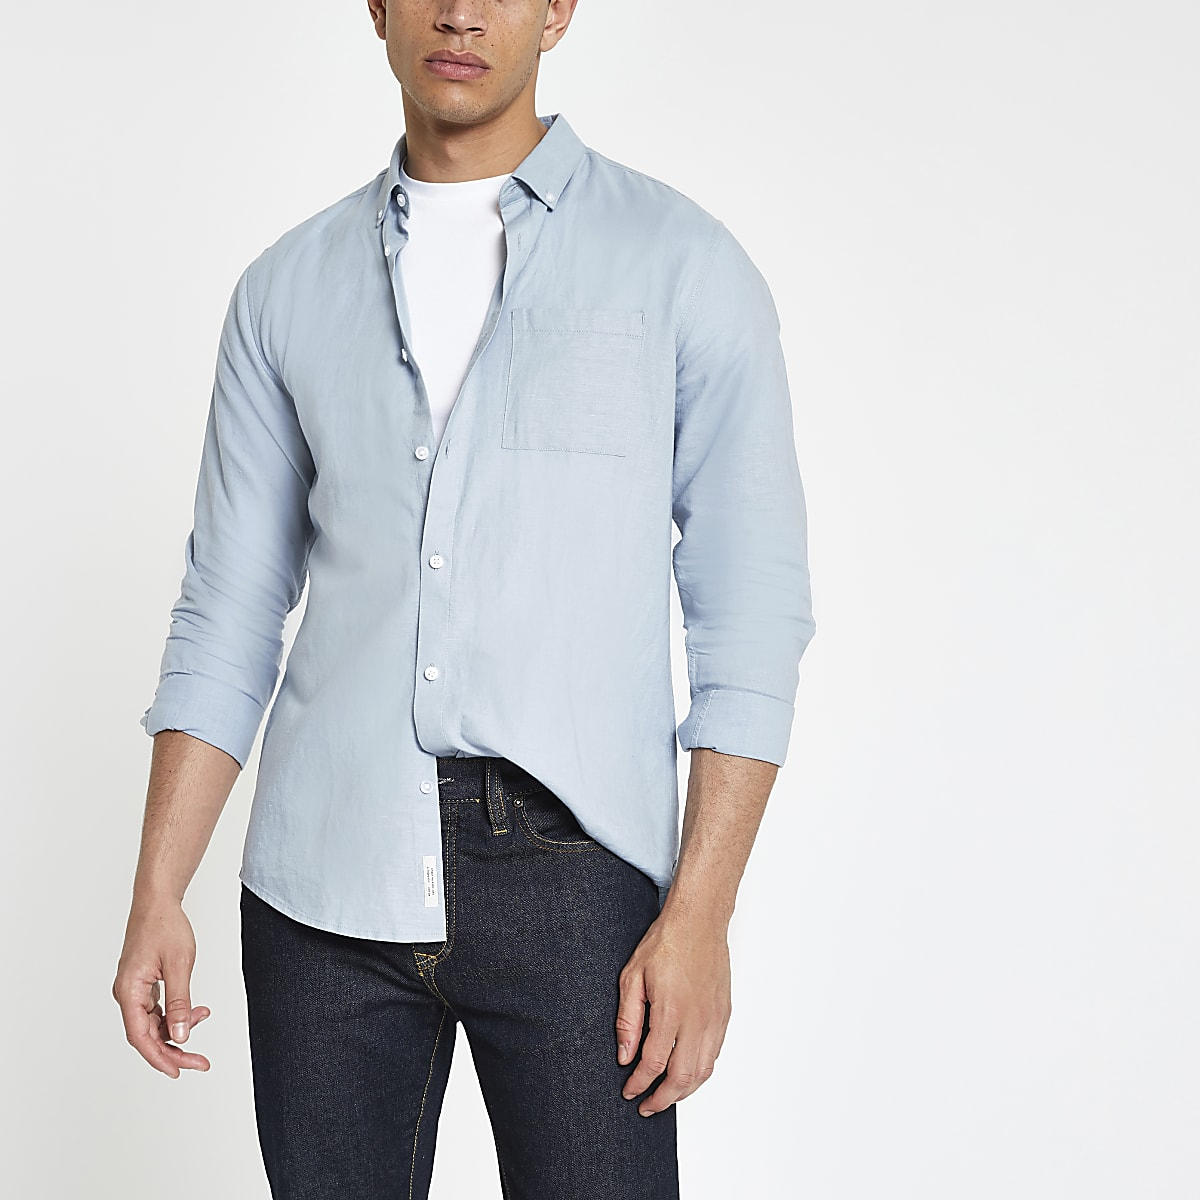 Zwart Linnen Heren Overhemd.Blauw Linnen Overhemd Met Lange Mouwen Overhemden Met Lange Mouwen